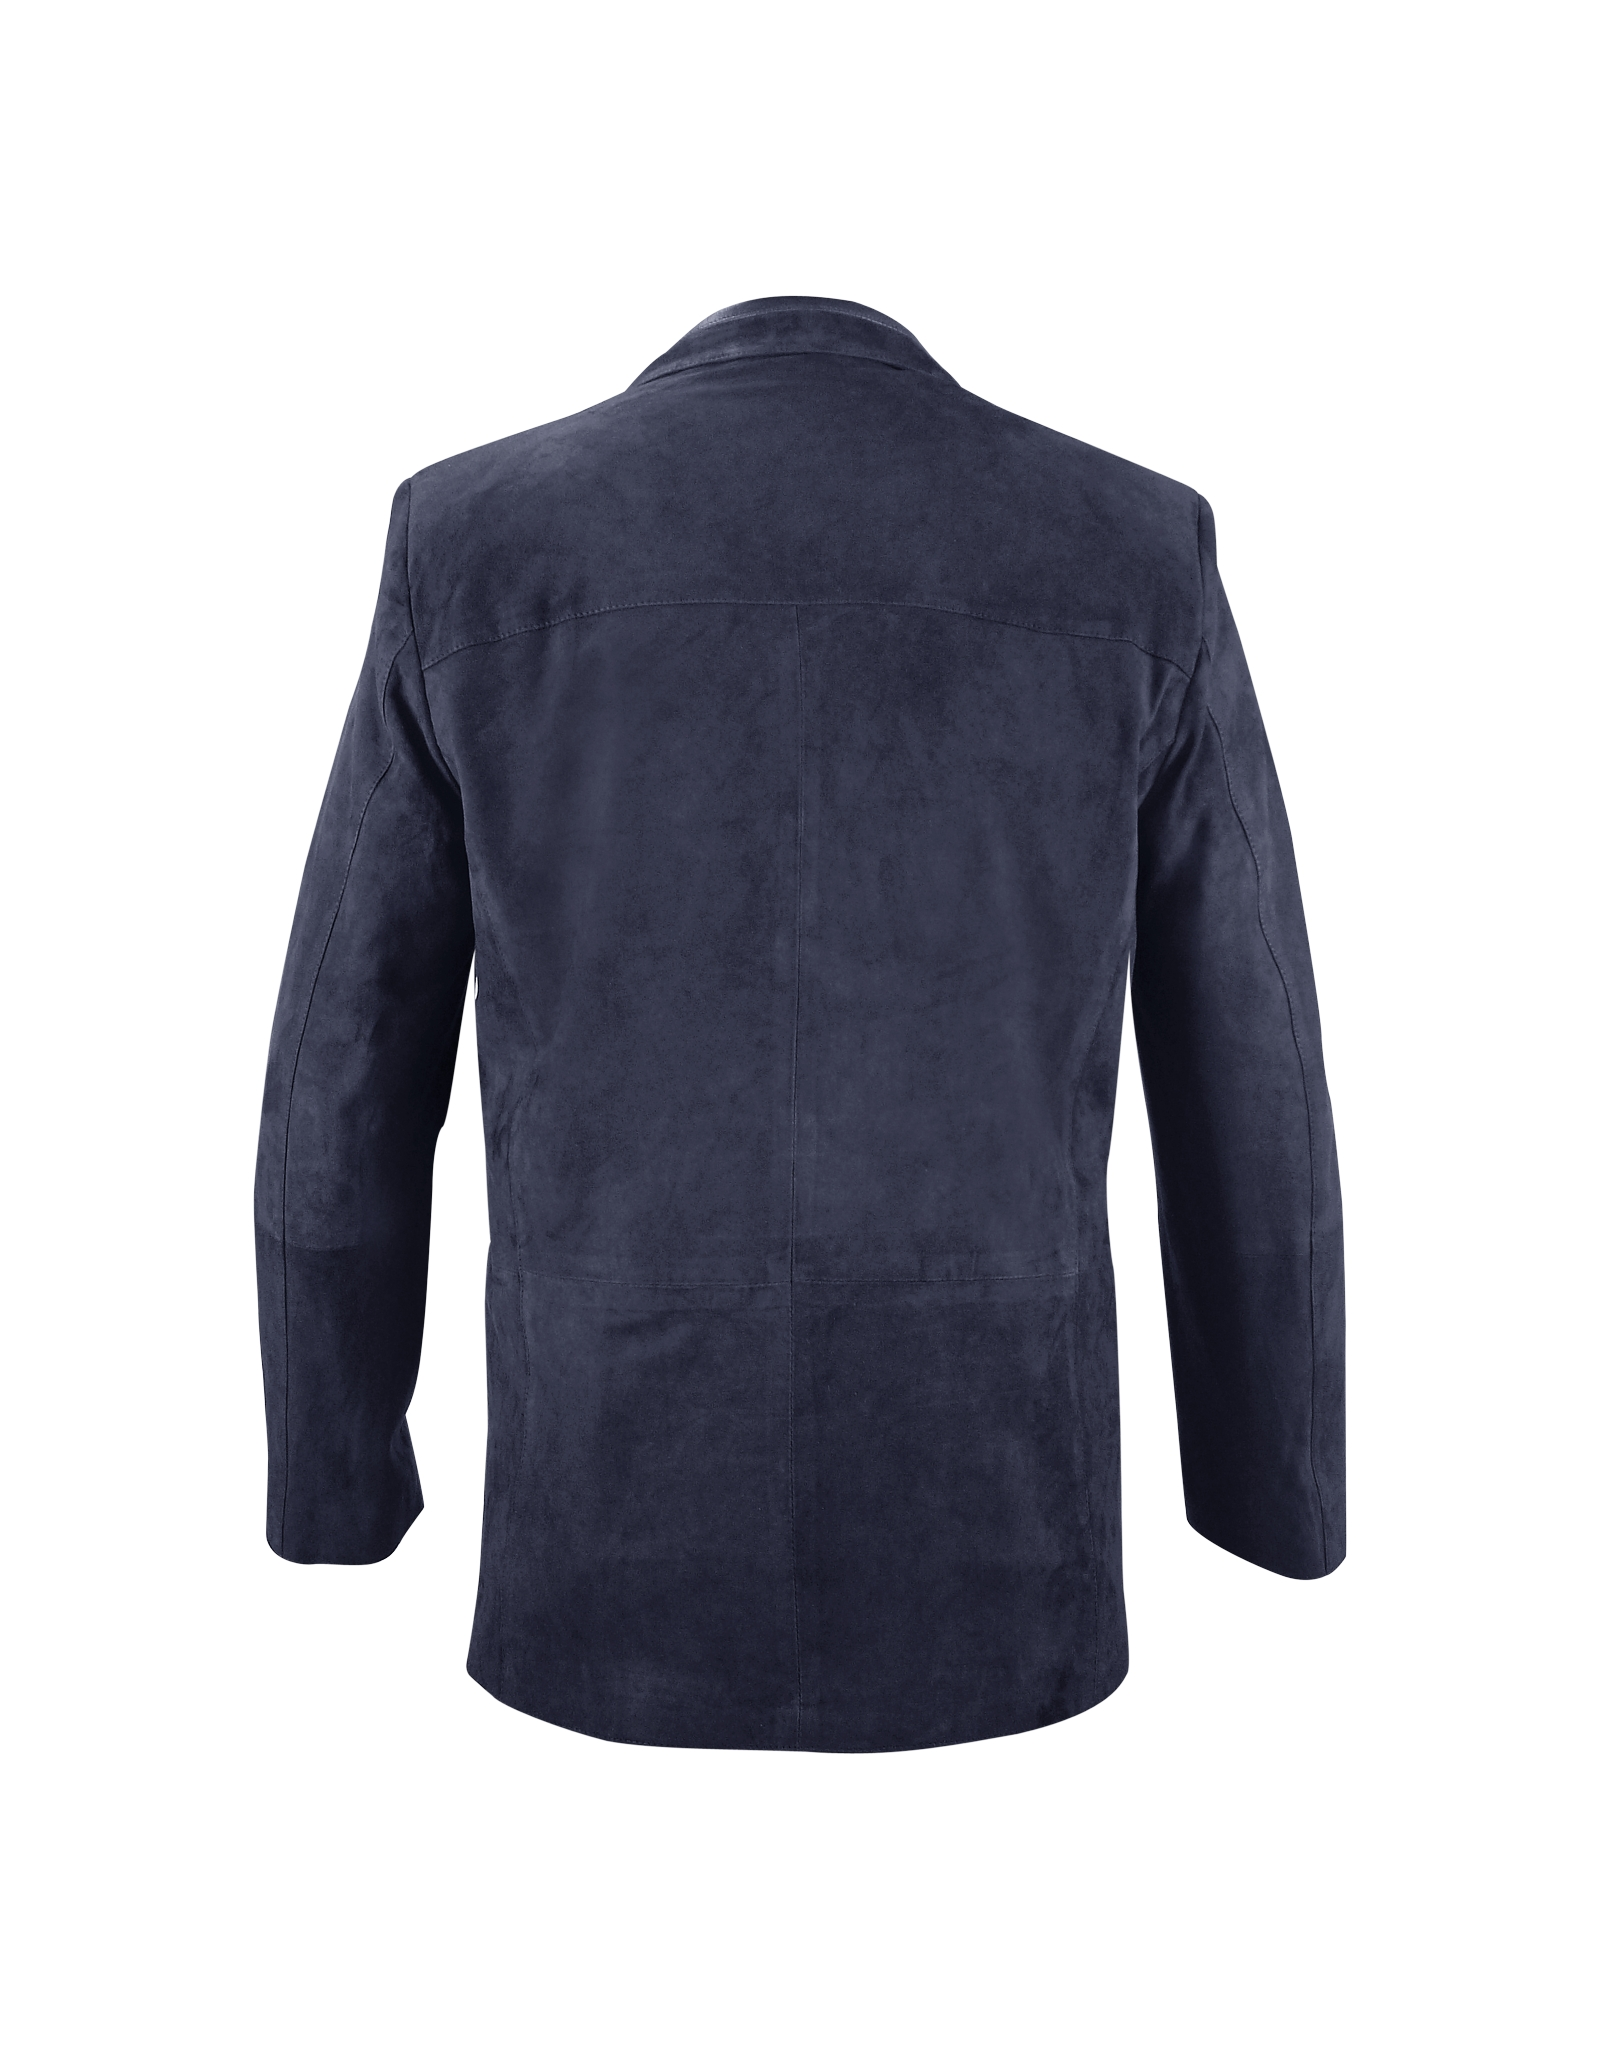 Lyst Moreschi Blue Suede Blazer Jacket In Blue For Men